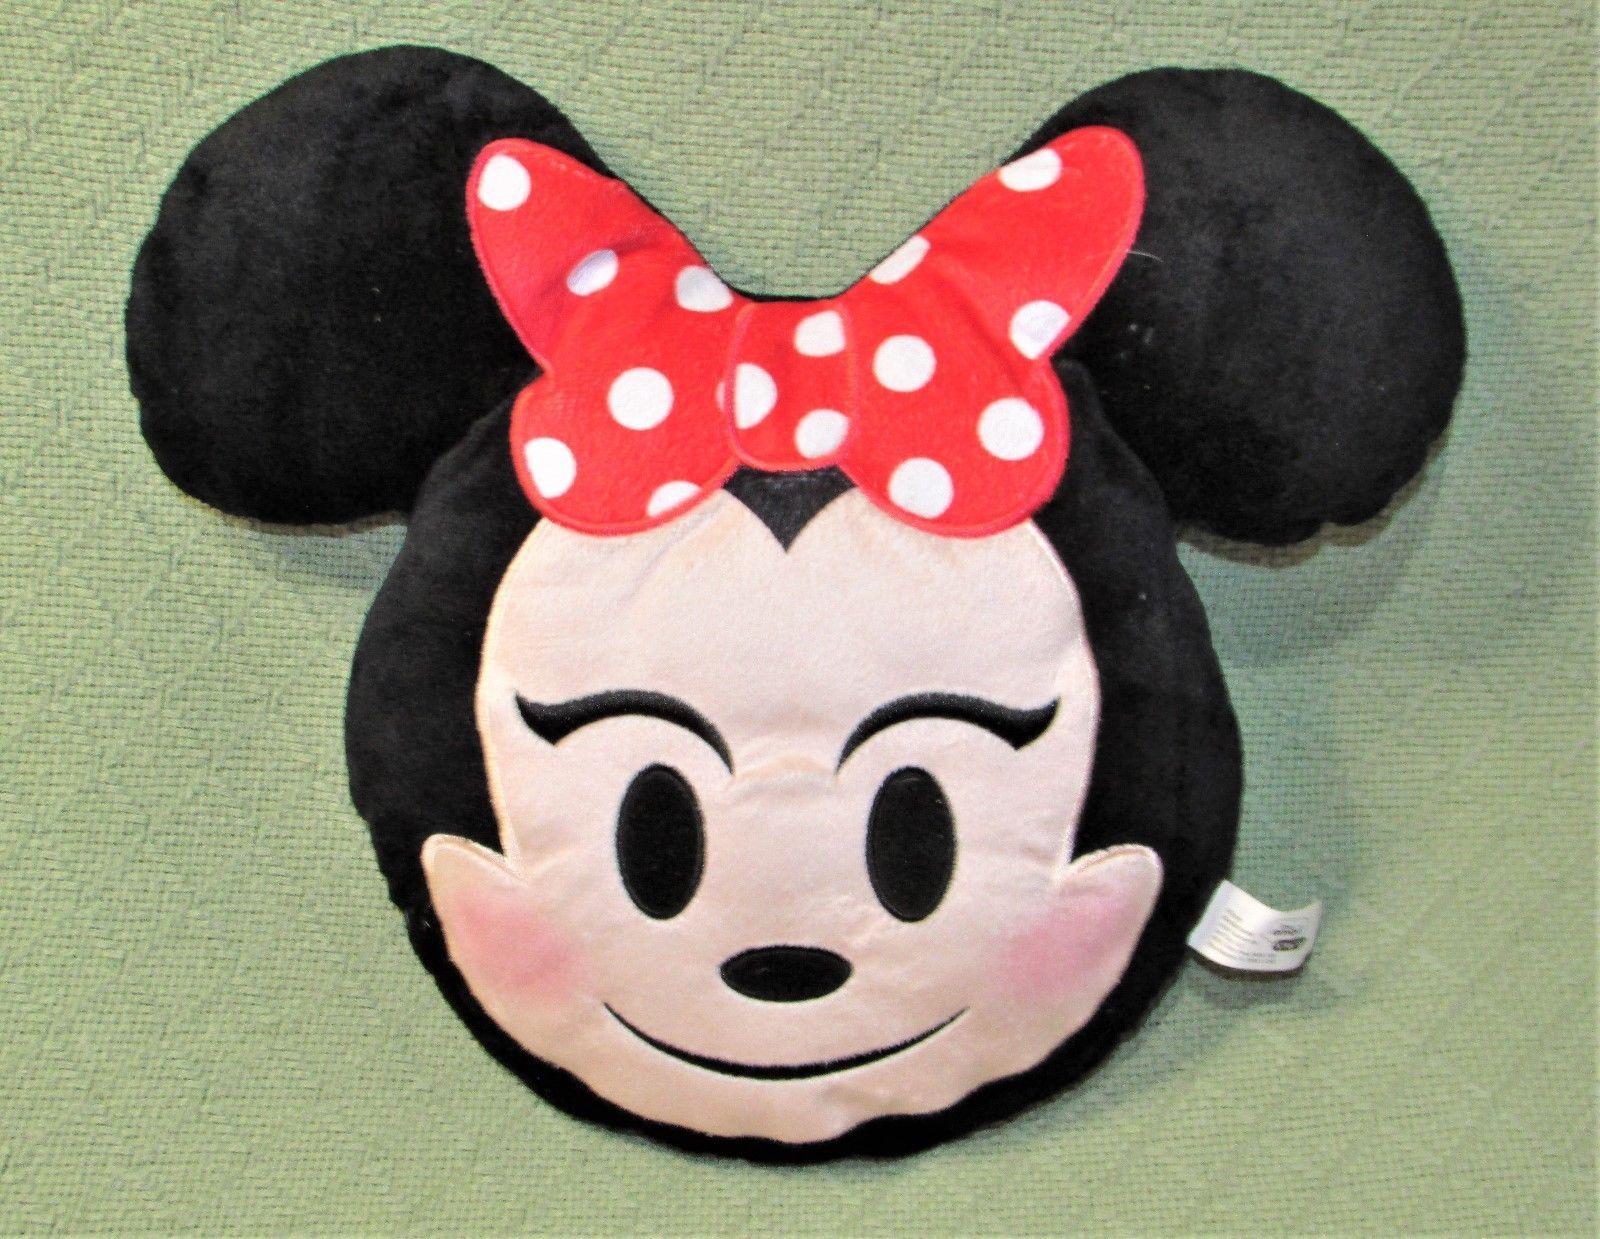 "Disney Minnie Mouse EMOJI PILLOW Plush Stuffed Character 11"" Red Bow Polka Dot"